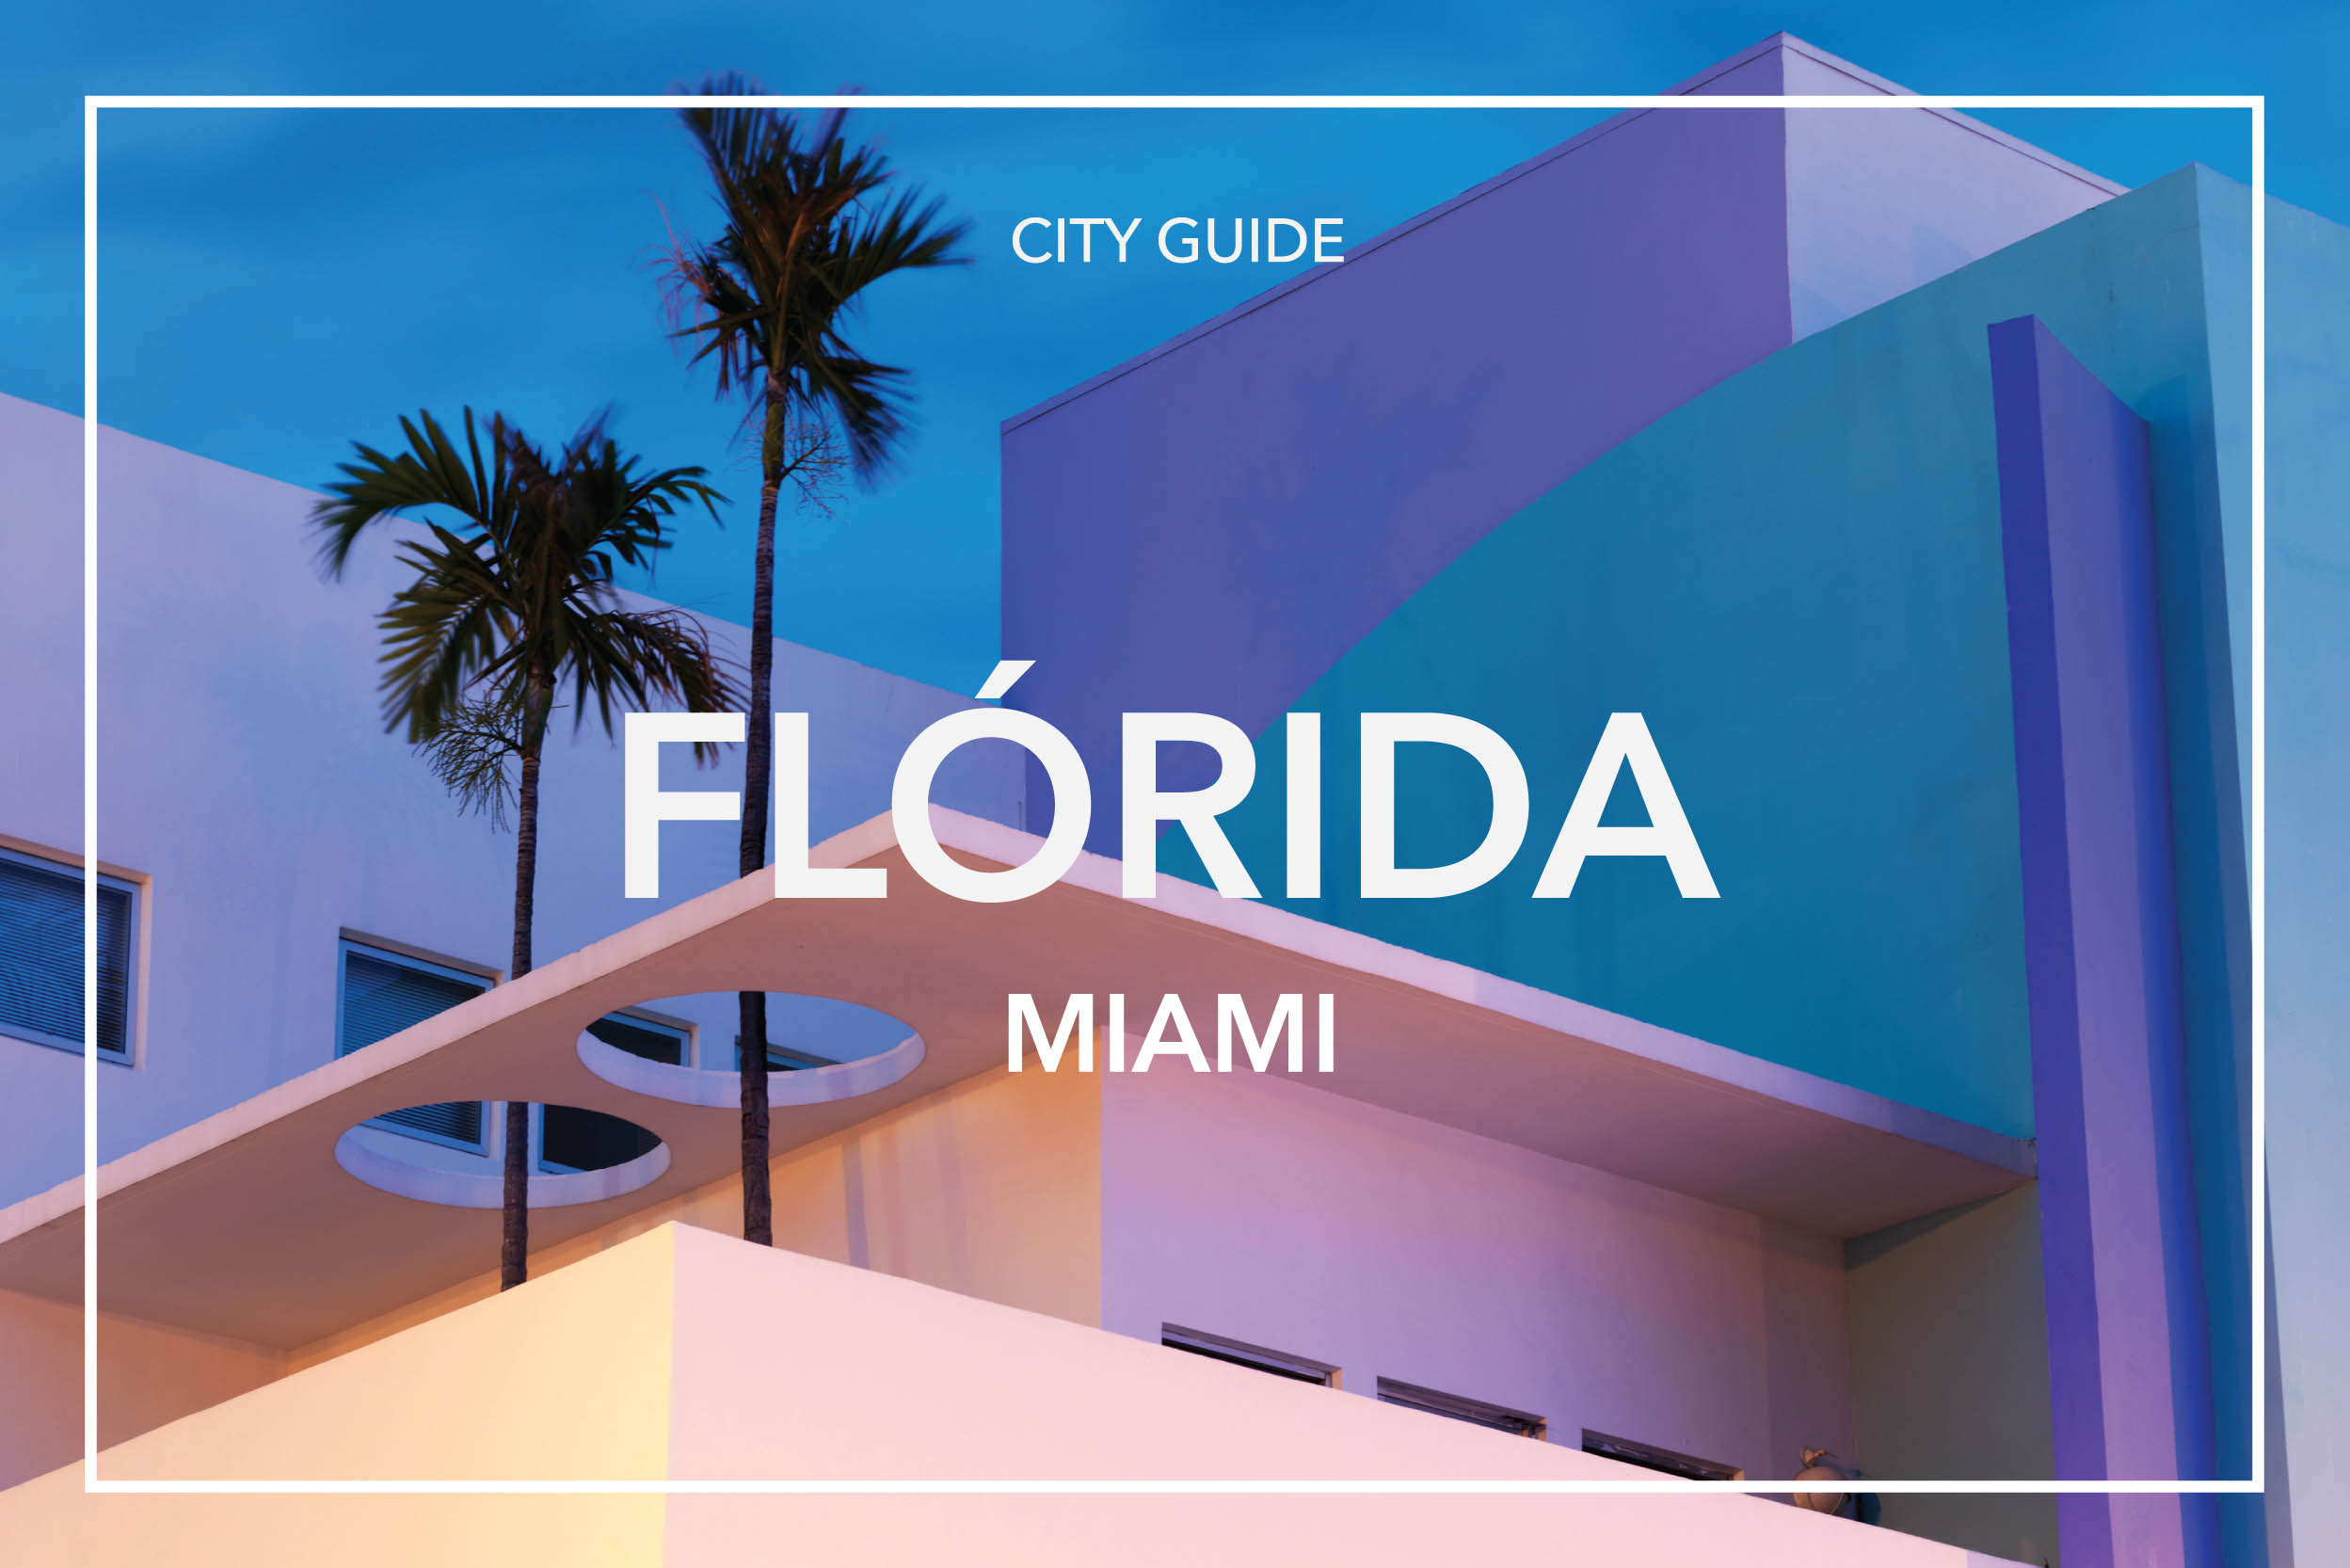 CITYGUIDE_FLORIDA_FRAME_MIAMI